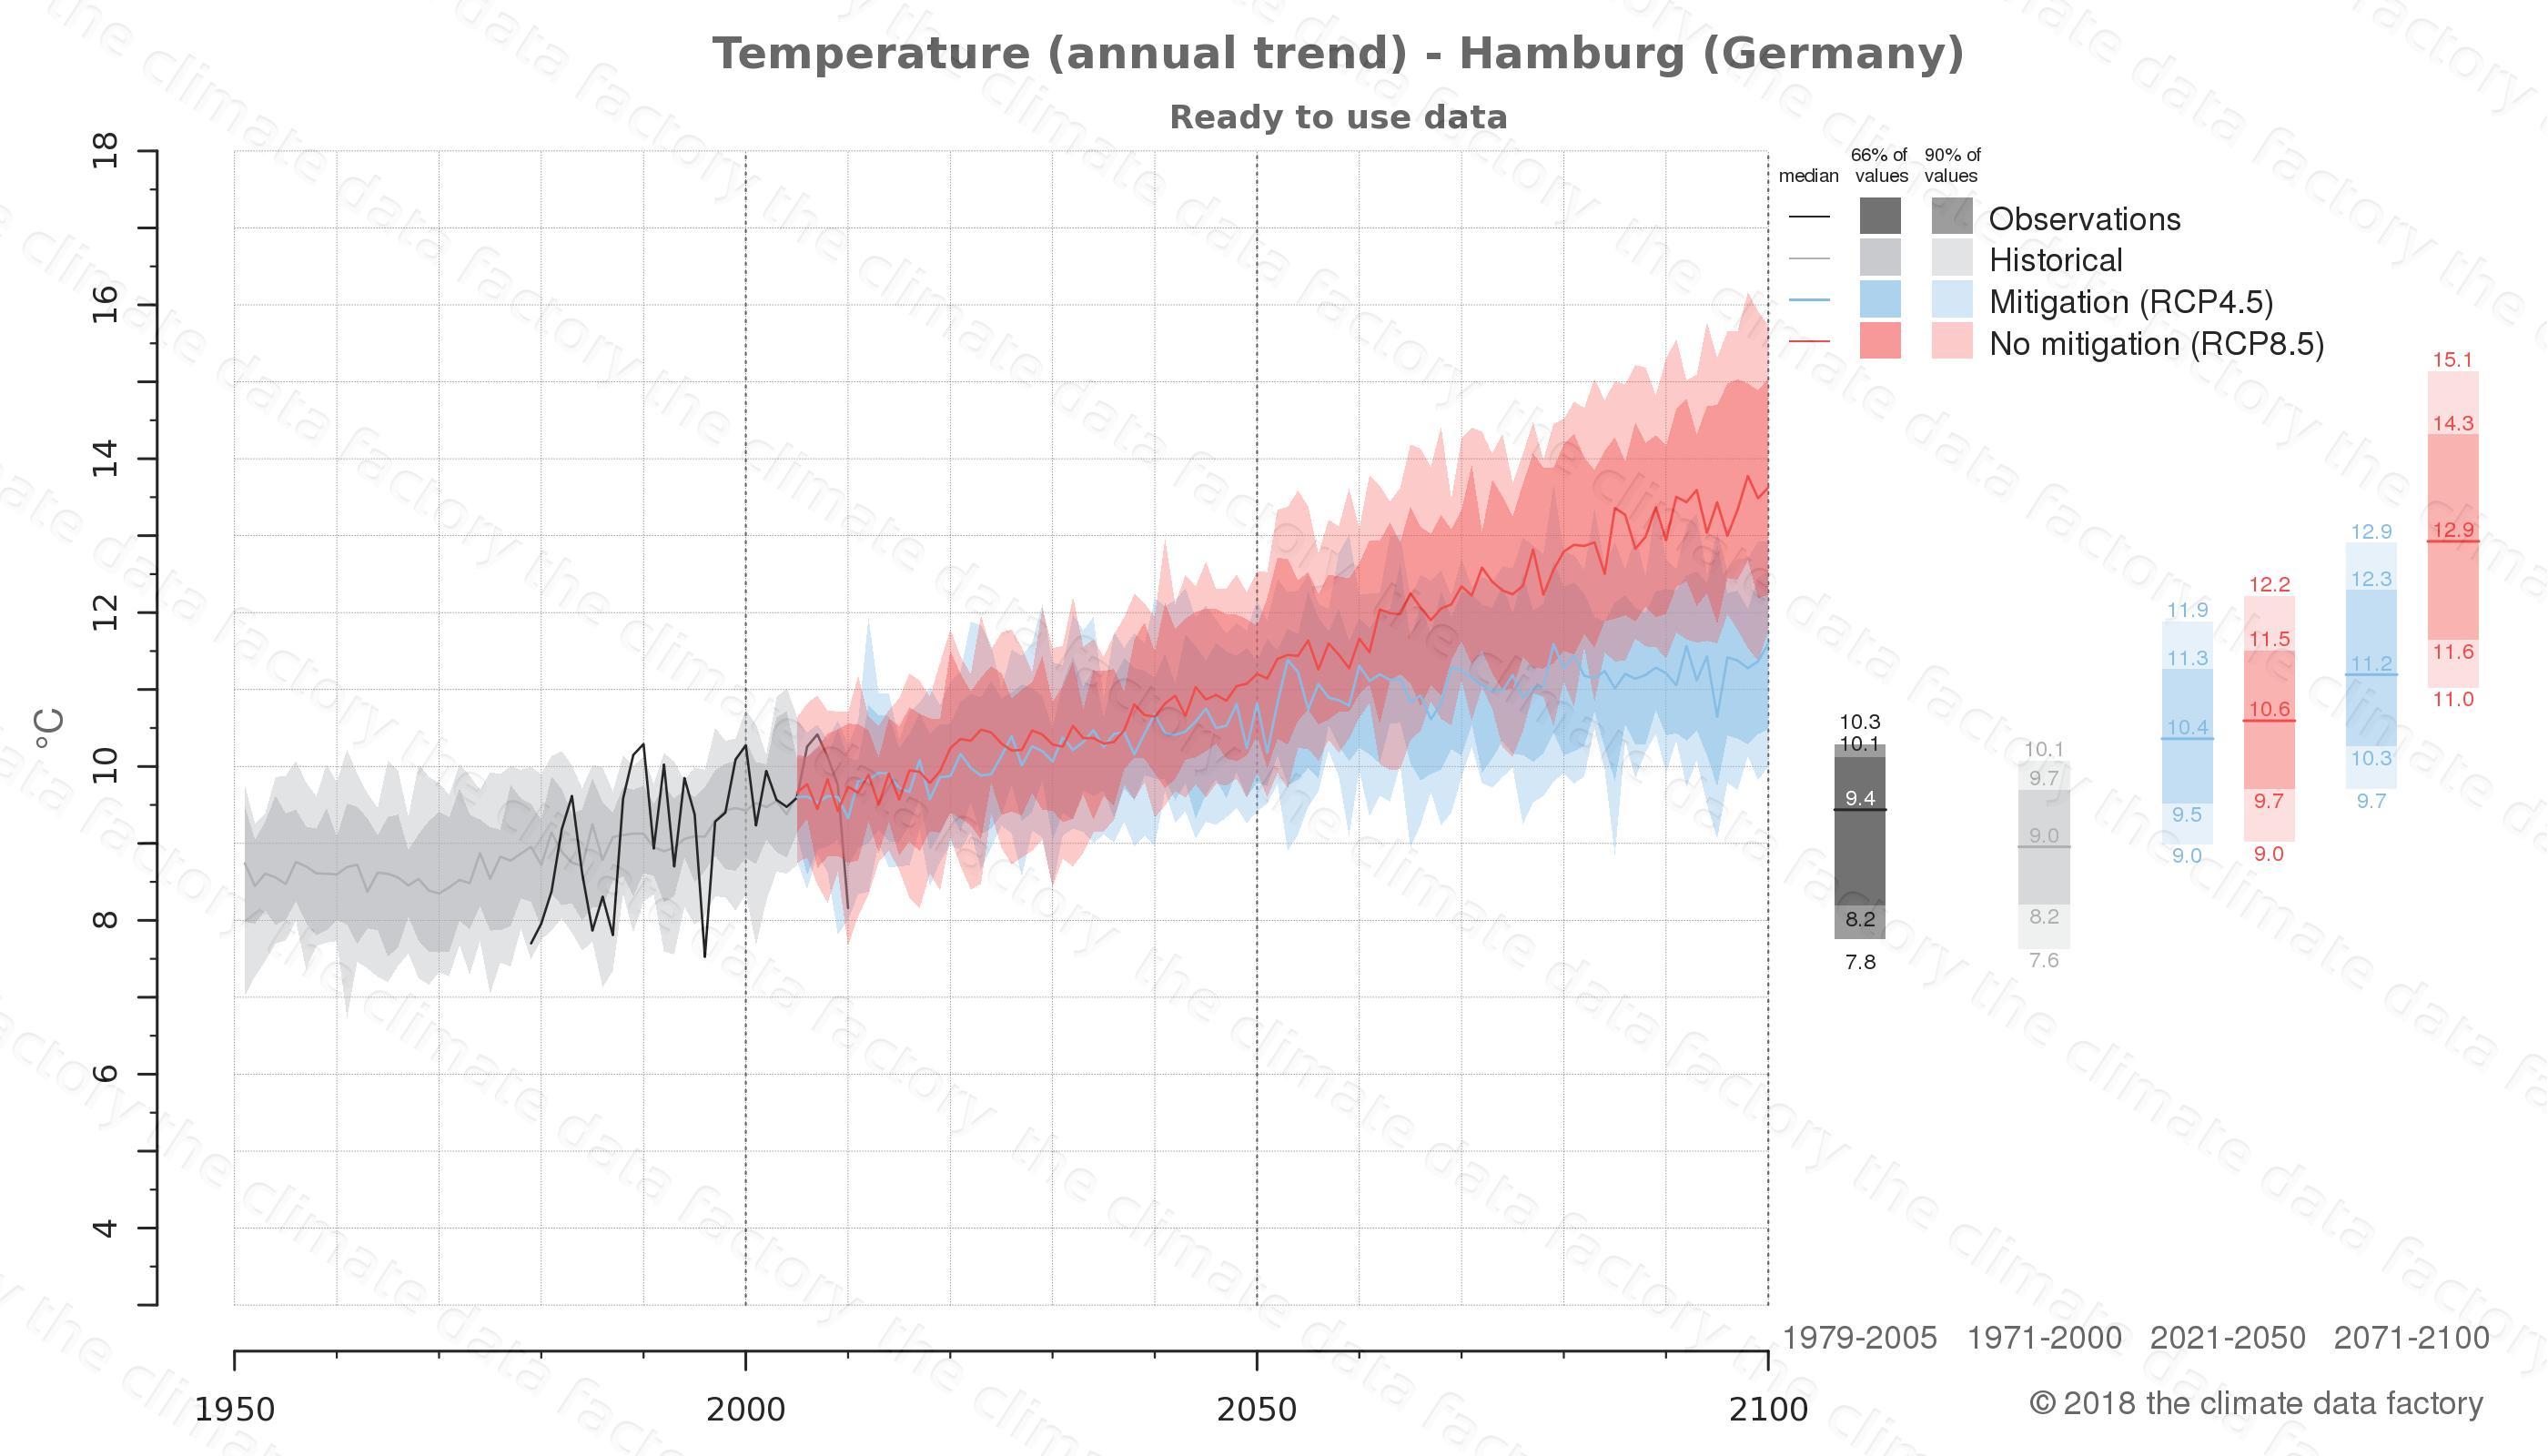 climate change data policy adaptation climate graph city data temperature hamburg germany